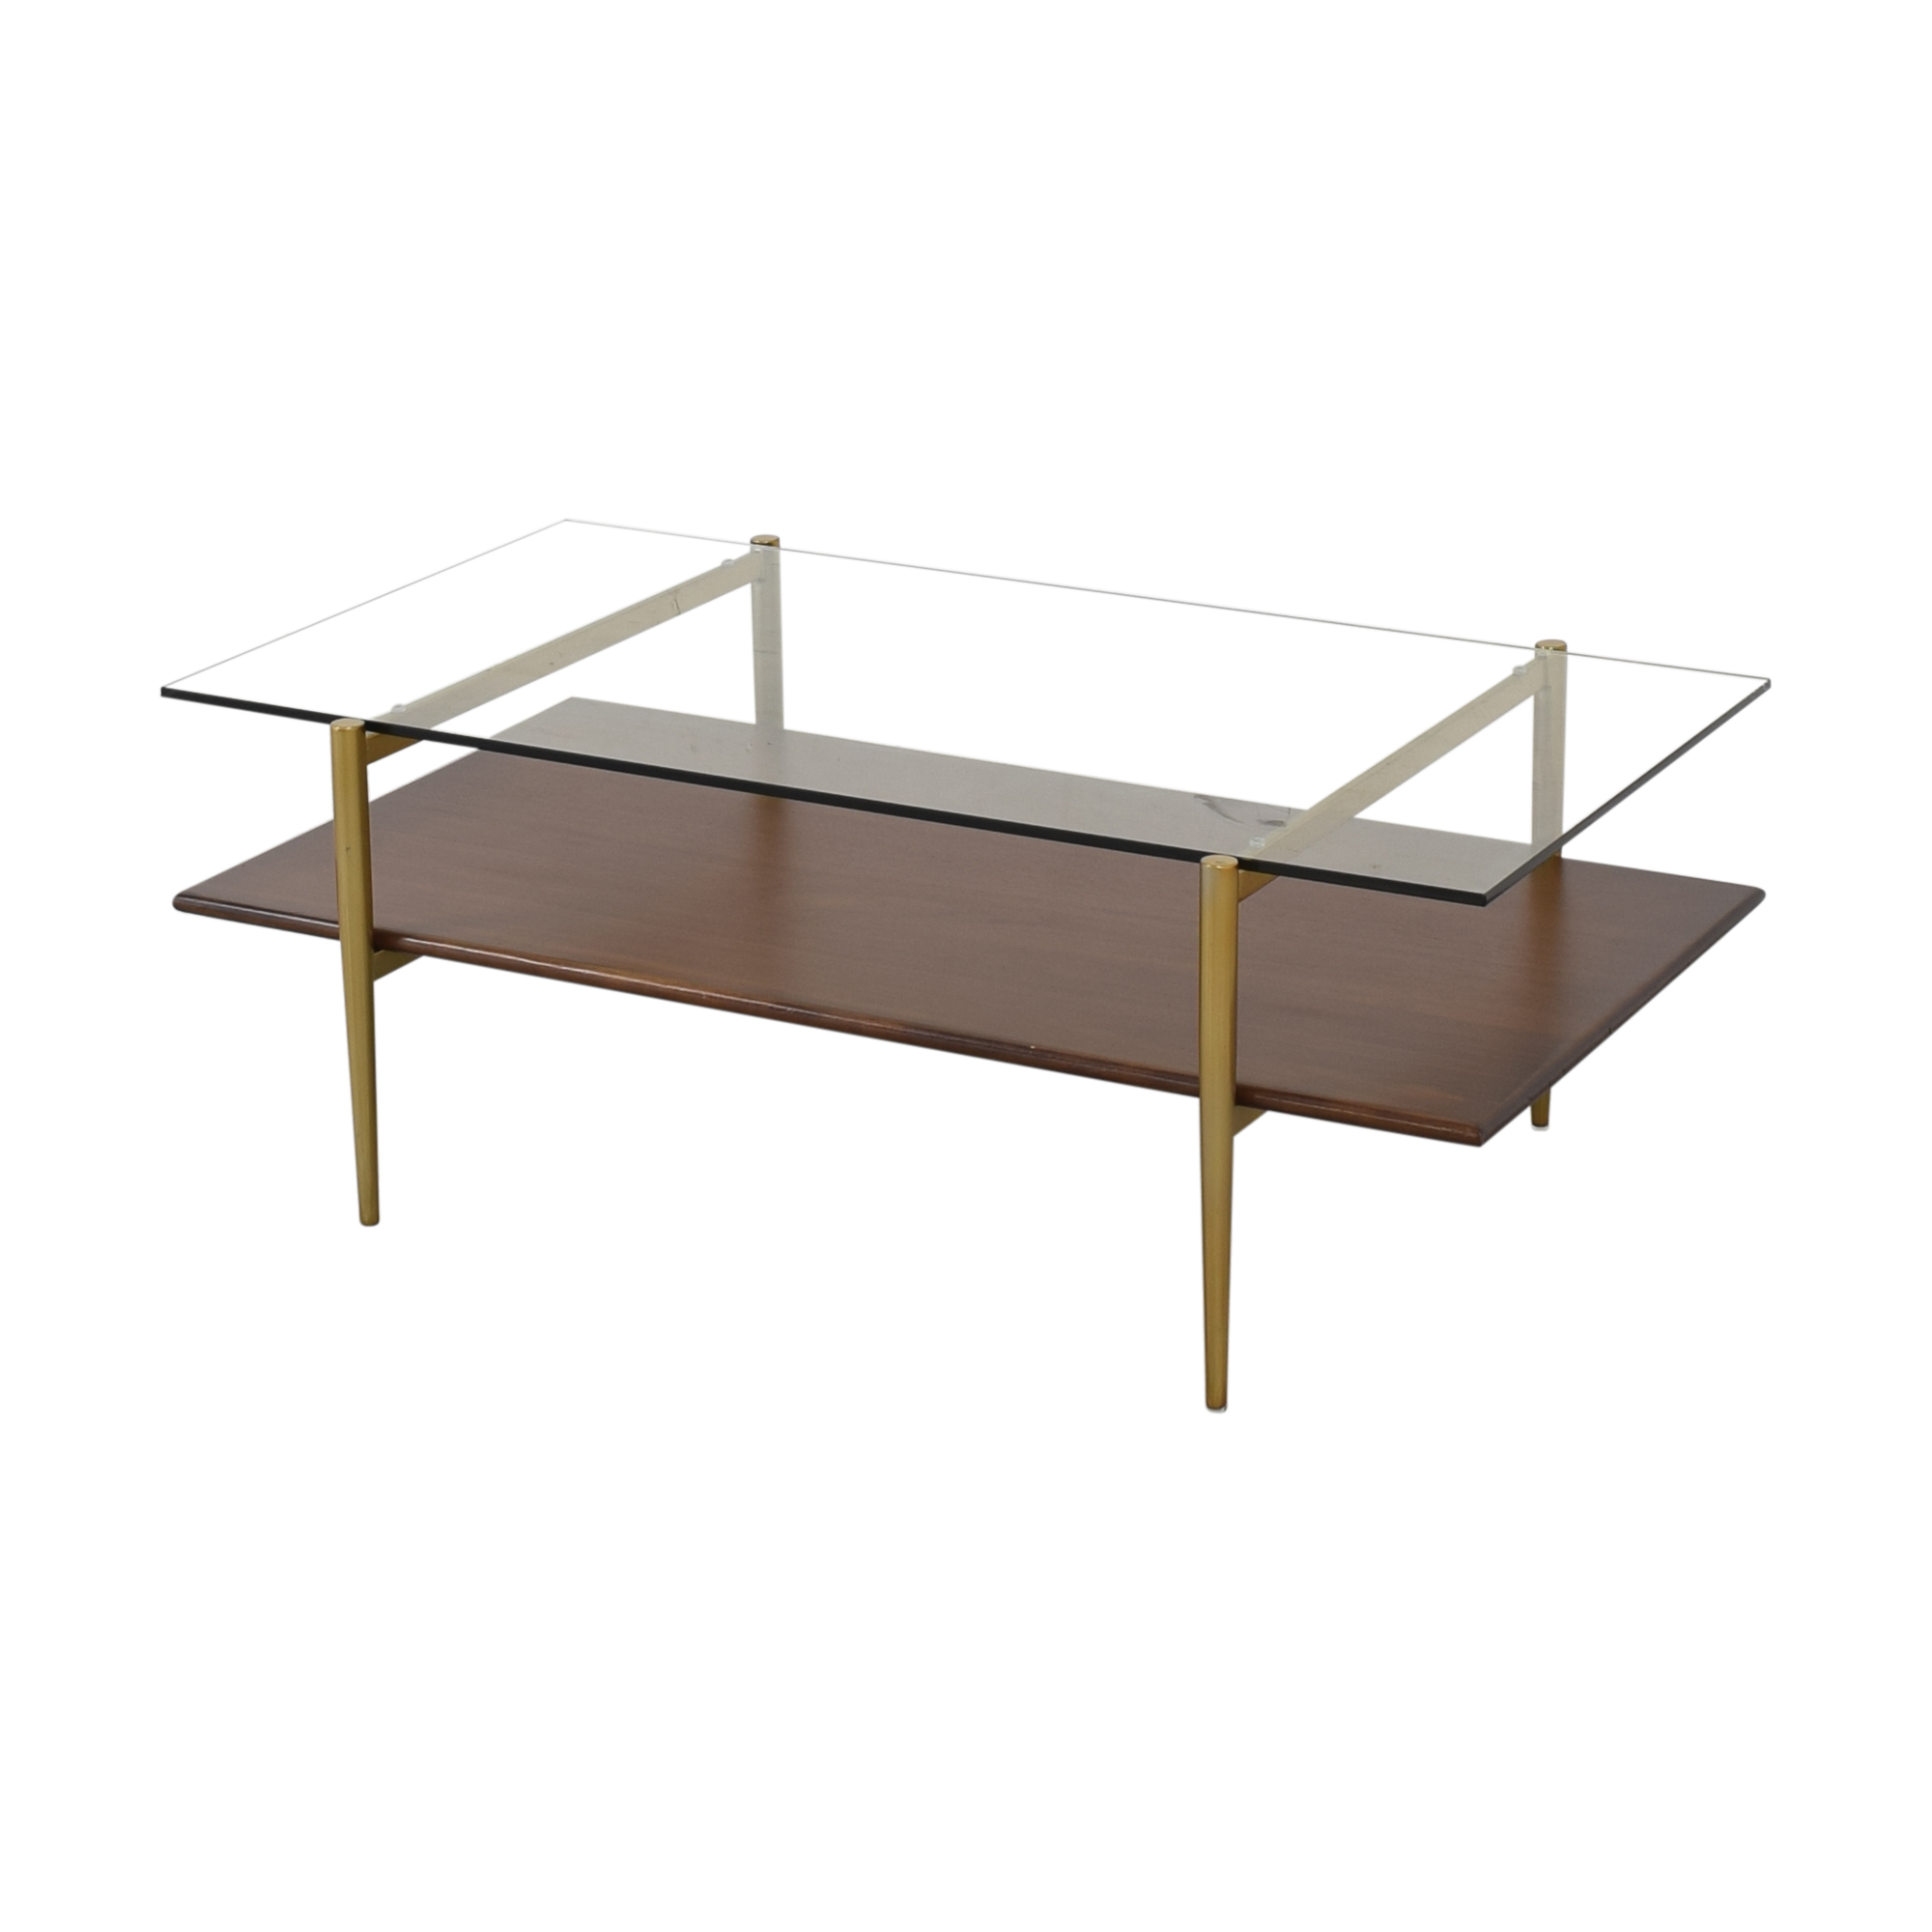 West Elm West Elm Mid-Century Art Display Coffee Table nyc